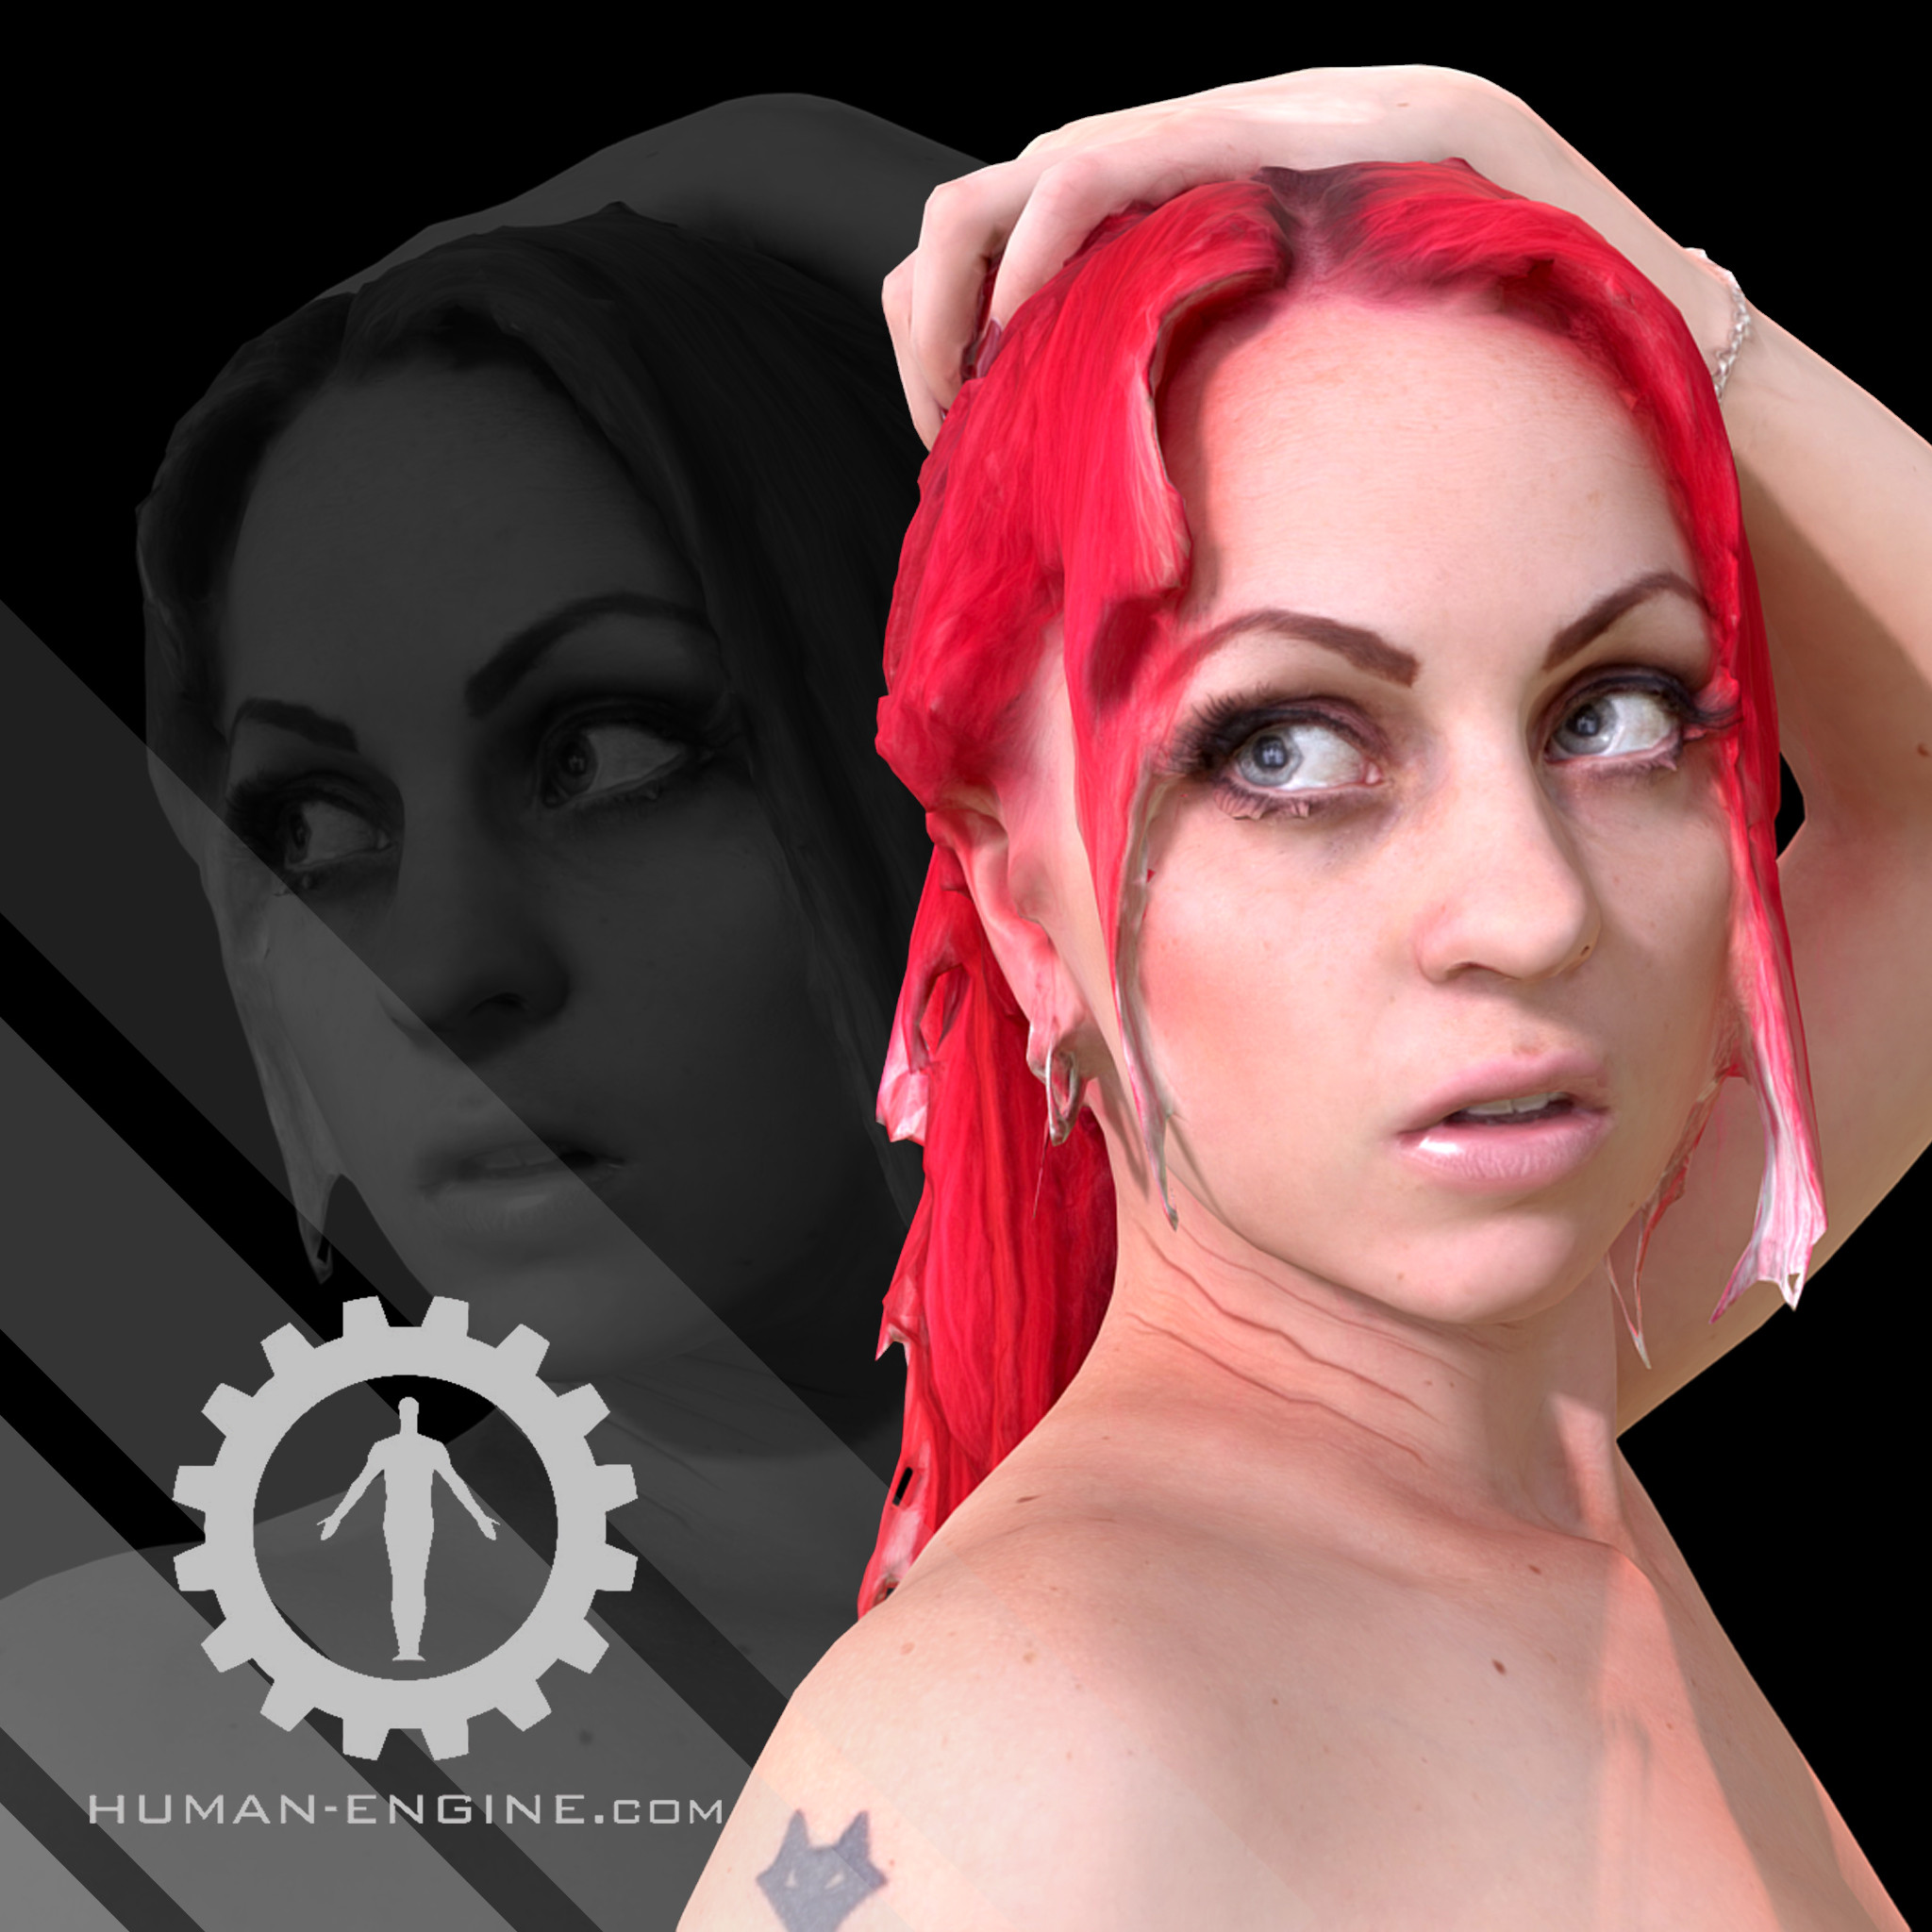 Sonya_Nude-MainThumbnail1.jpg